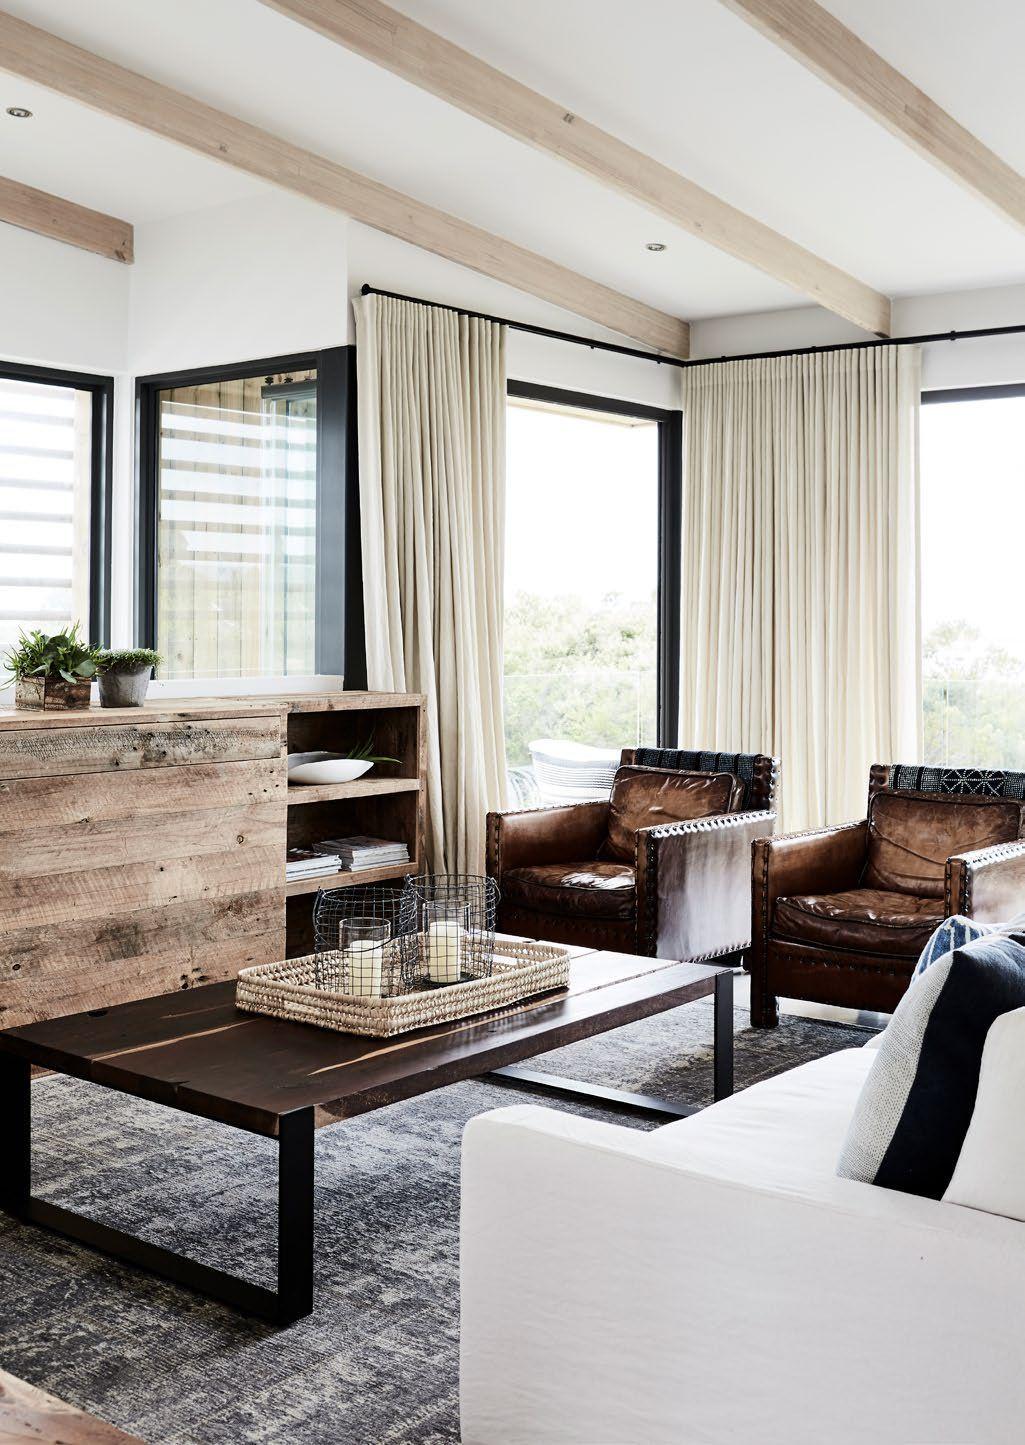 Est living home inspiration interior design decor interiors magazine minimal minimalist homes summer also issue in inspiring rh pinterest